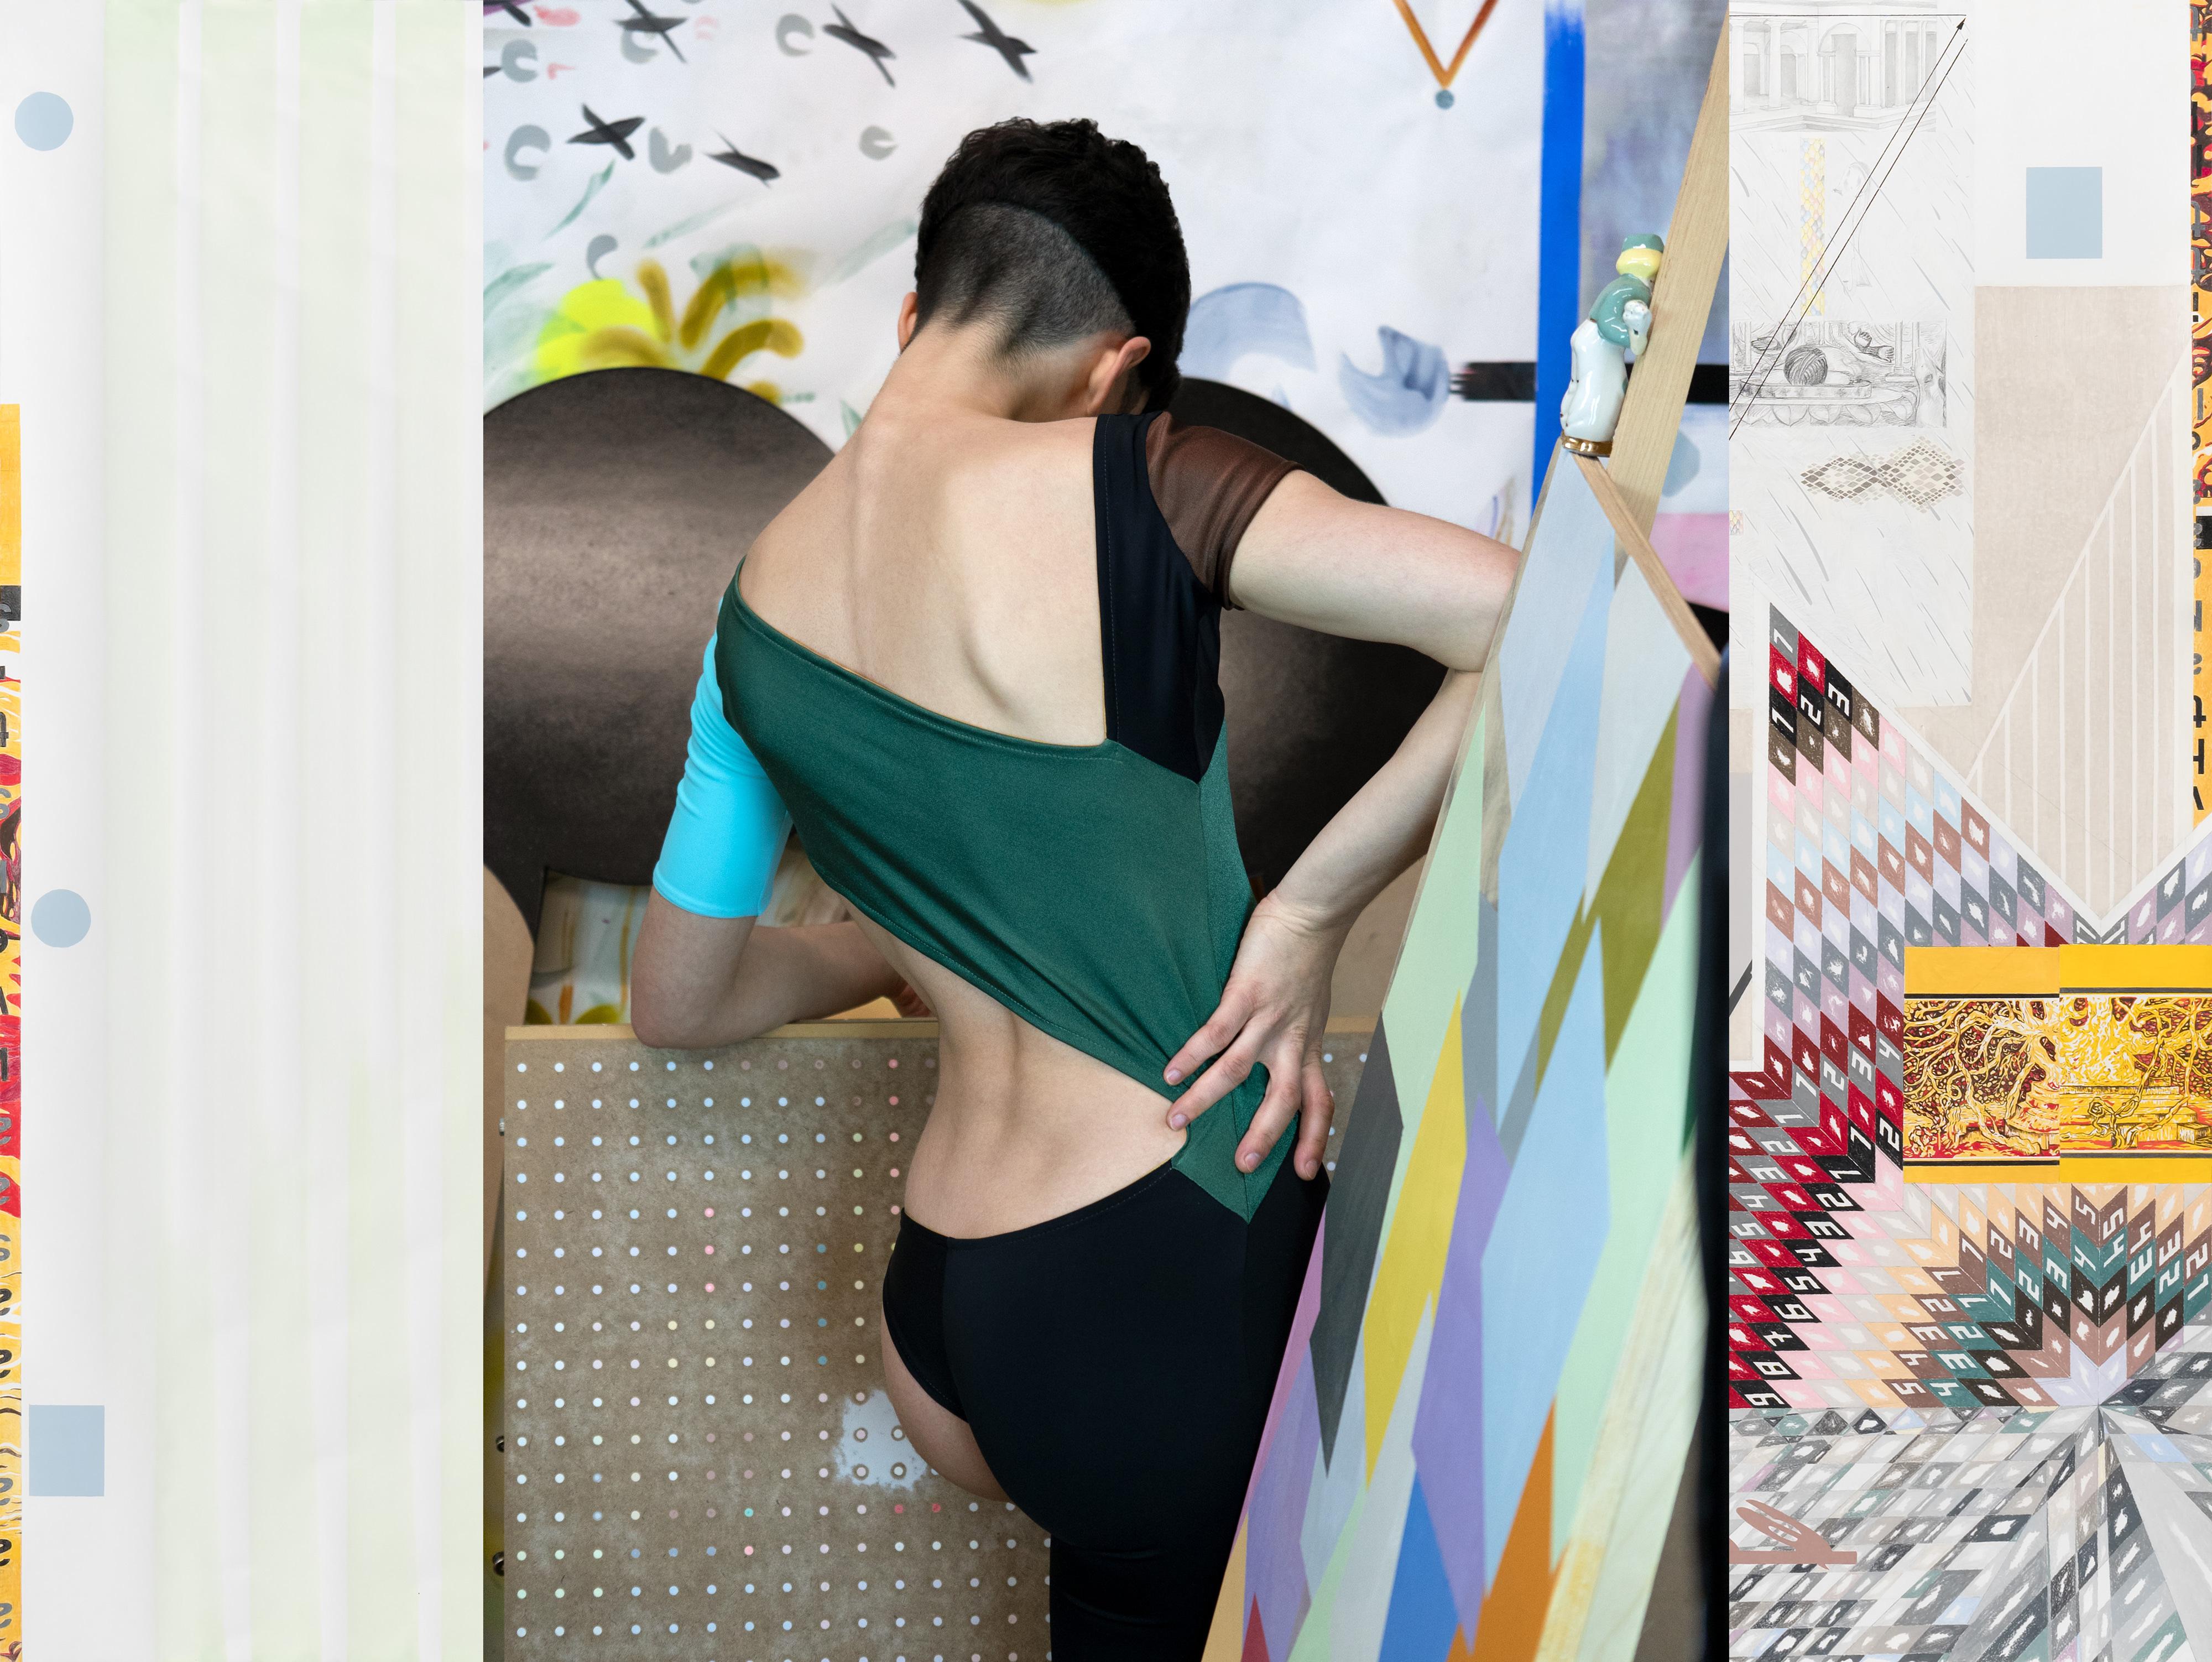 Galerie Barbara Thumm \ New Viewings #3 \ Anna K.E.